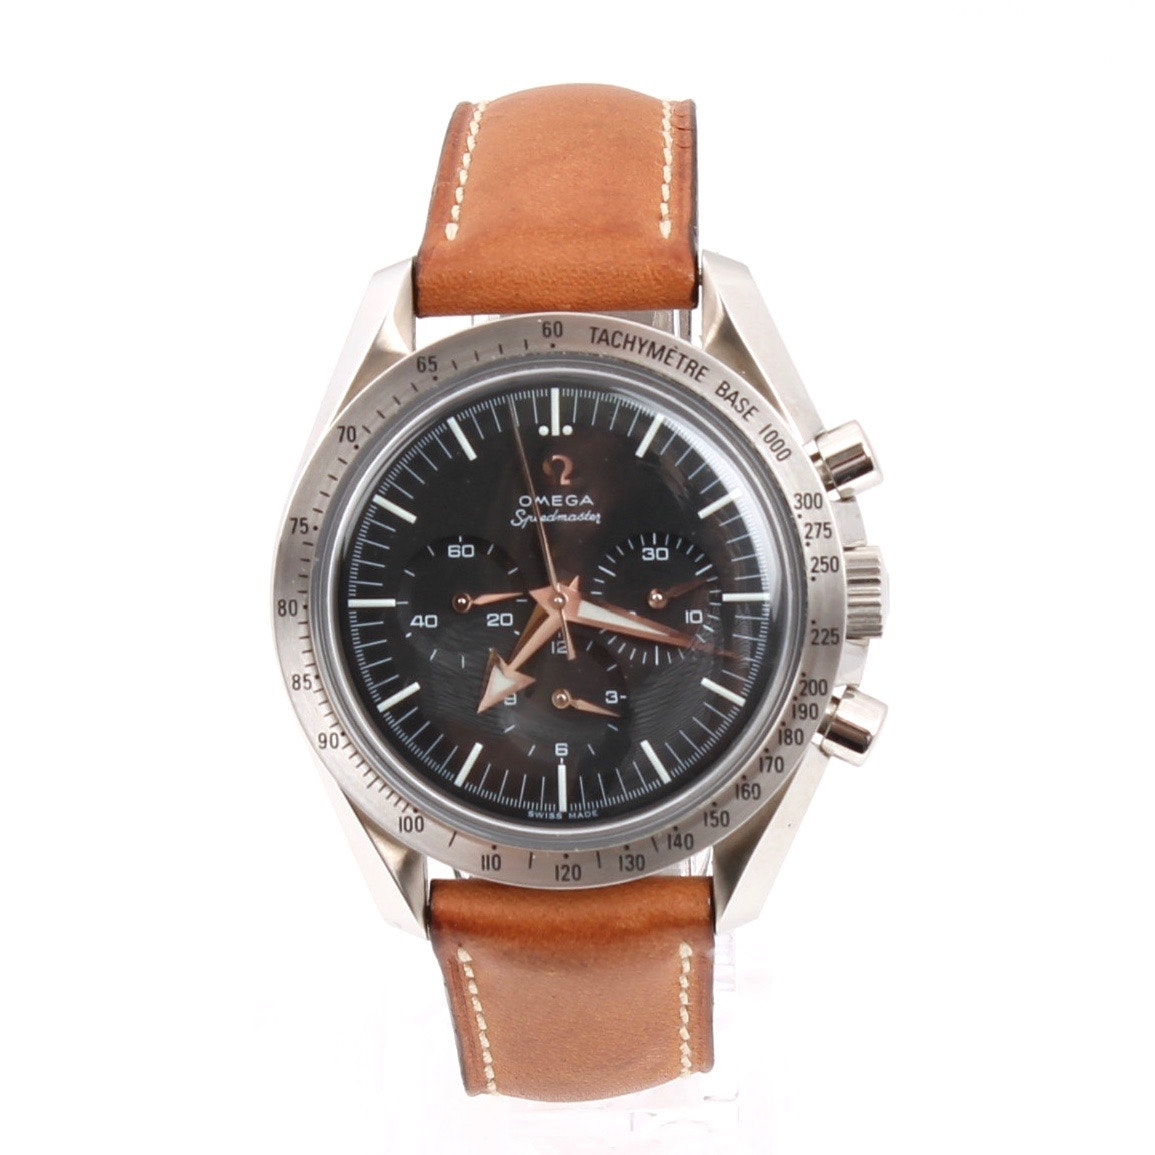 Omega Speedmaster Stainless Steel Mechanical Chronograph Wristwatch